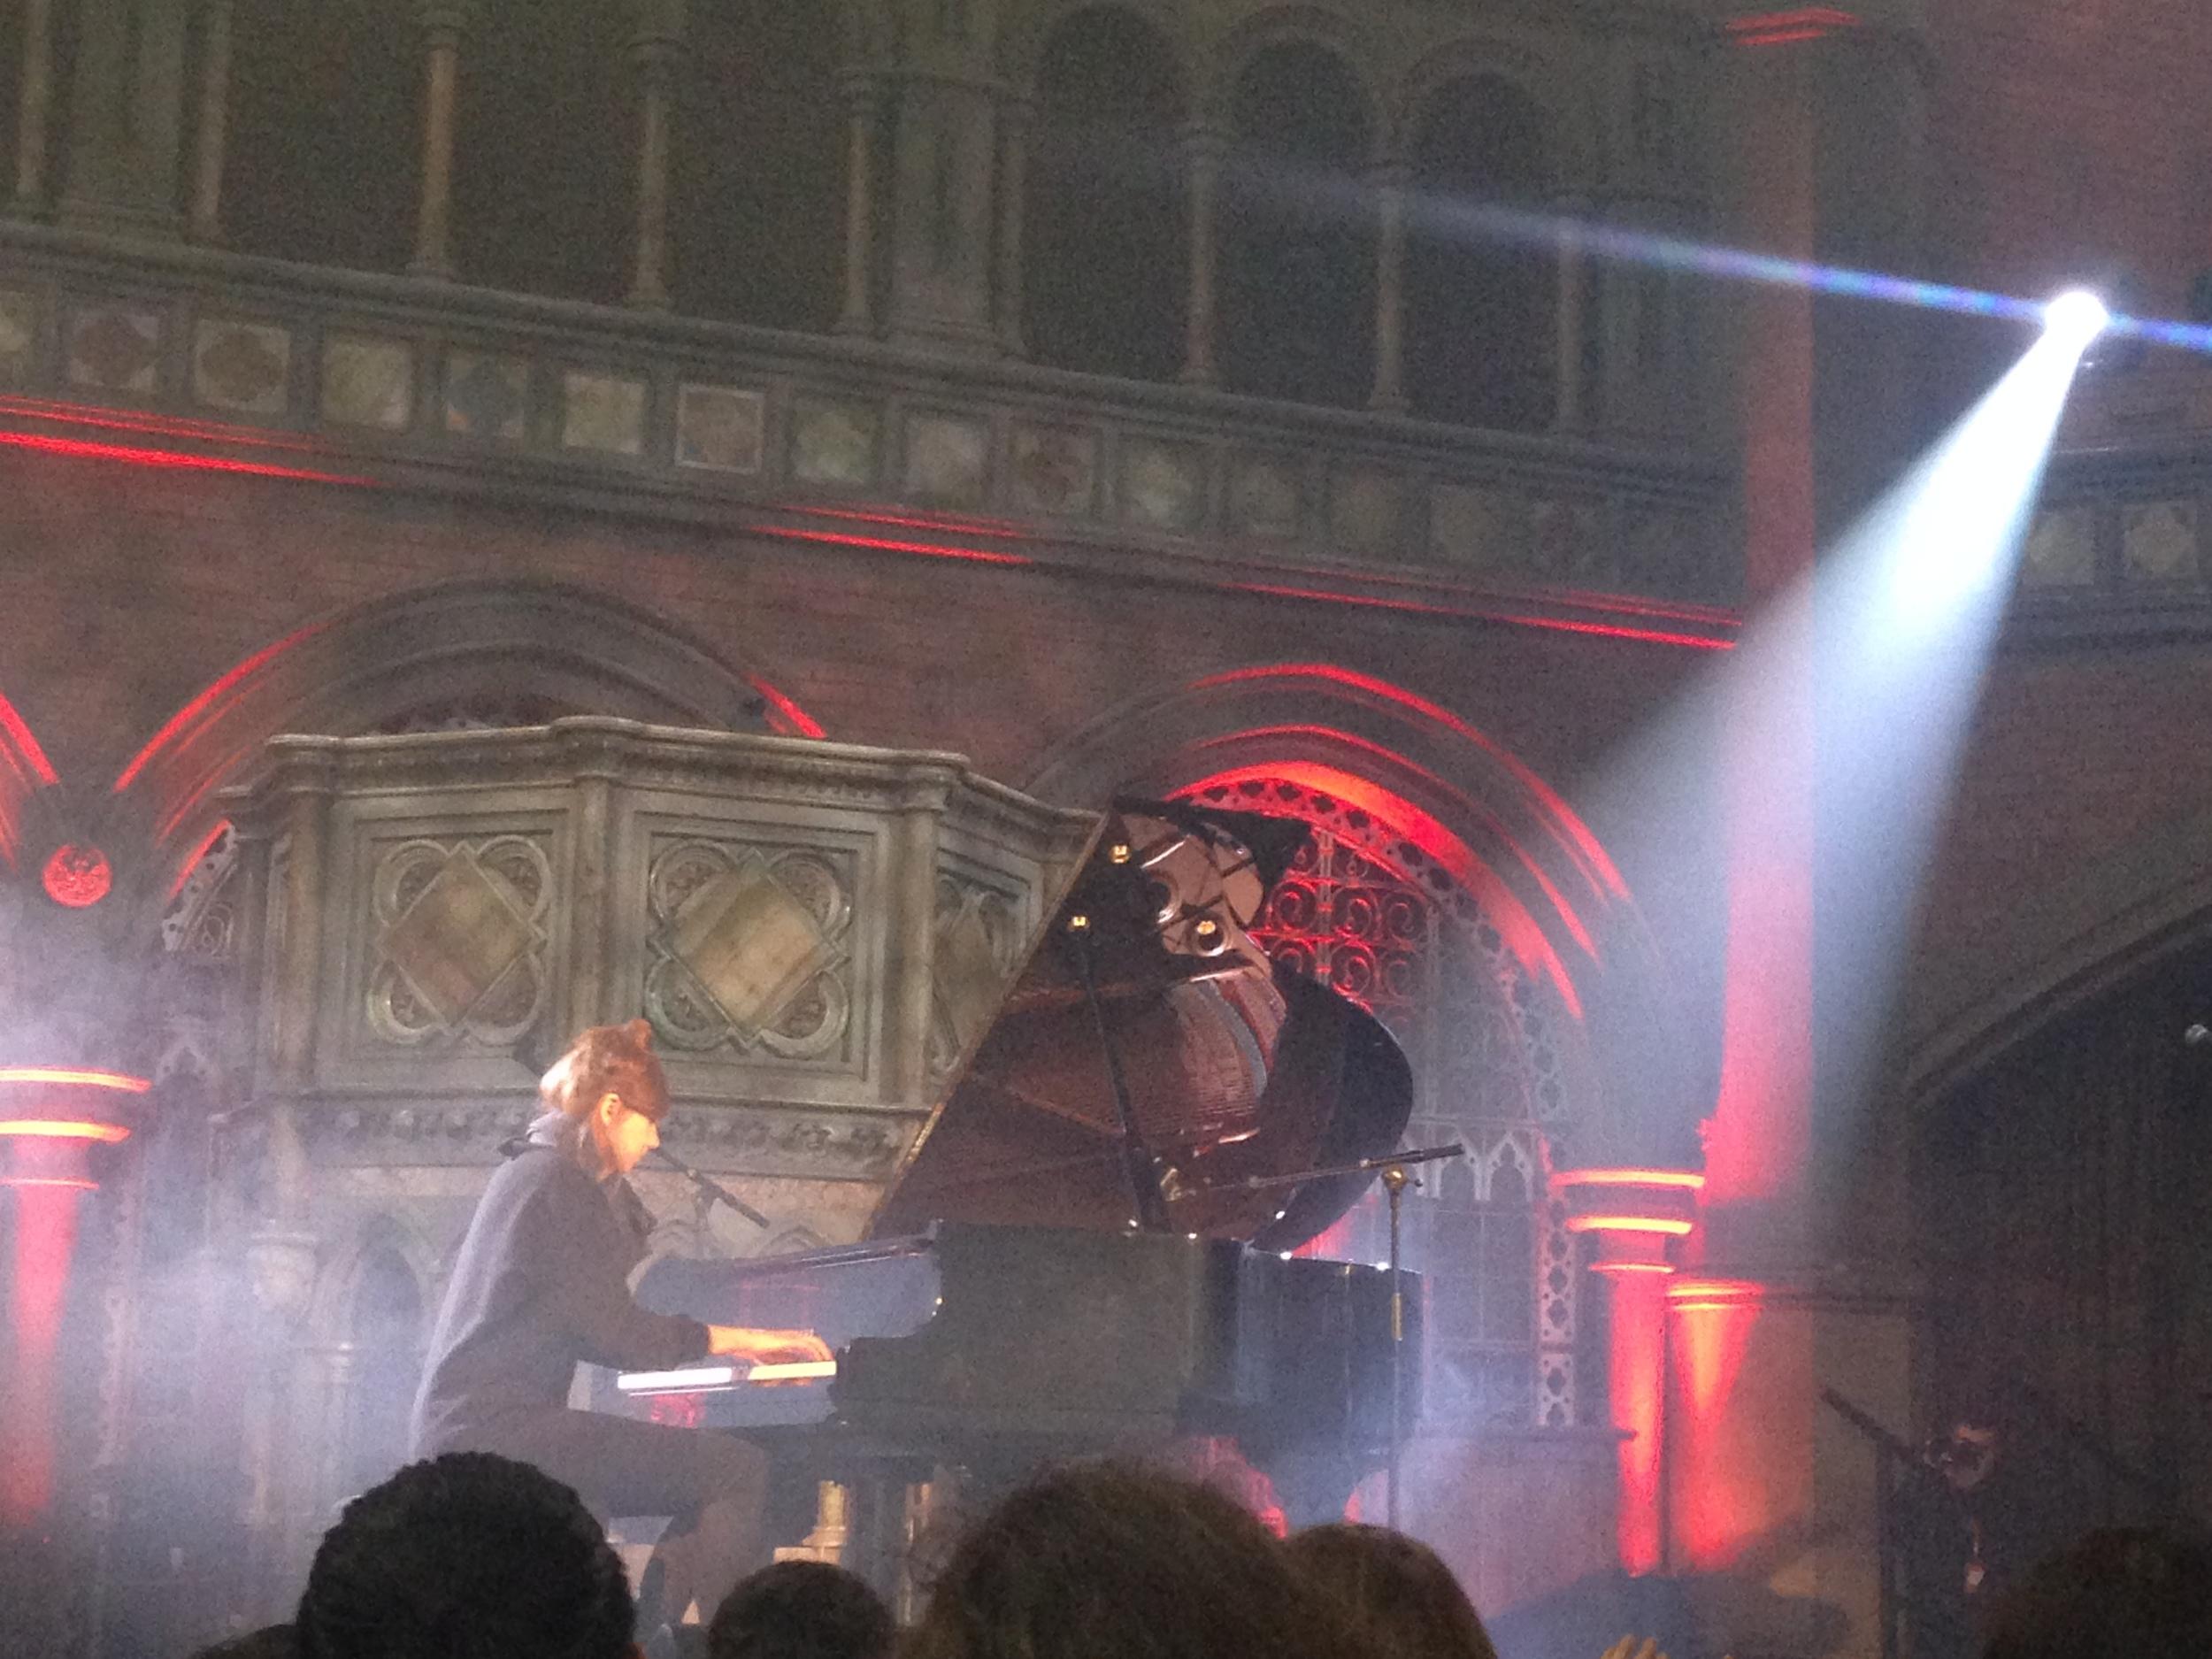 Poppy Ackroyd, Daylight Music gig for Piano Day, Union Chapel, Islington, London 26 March 2016